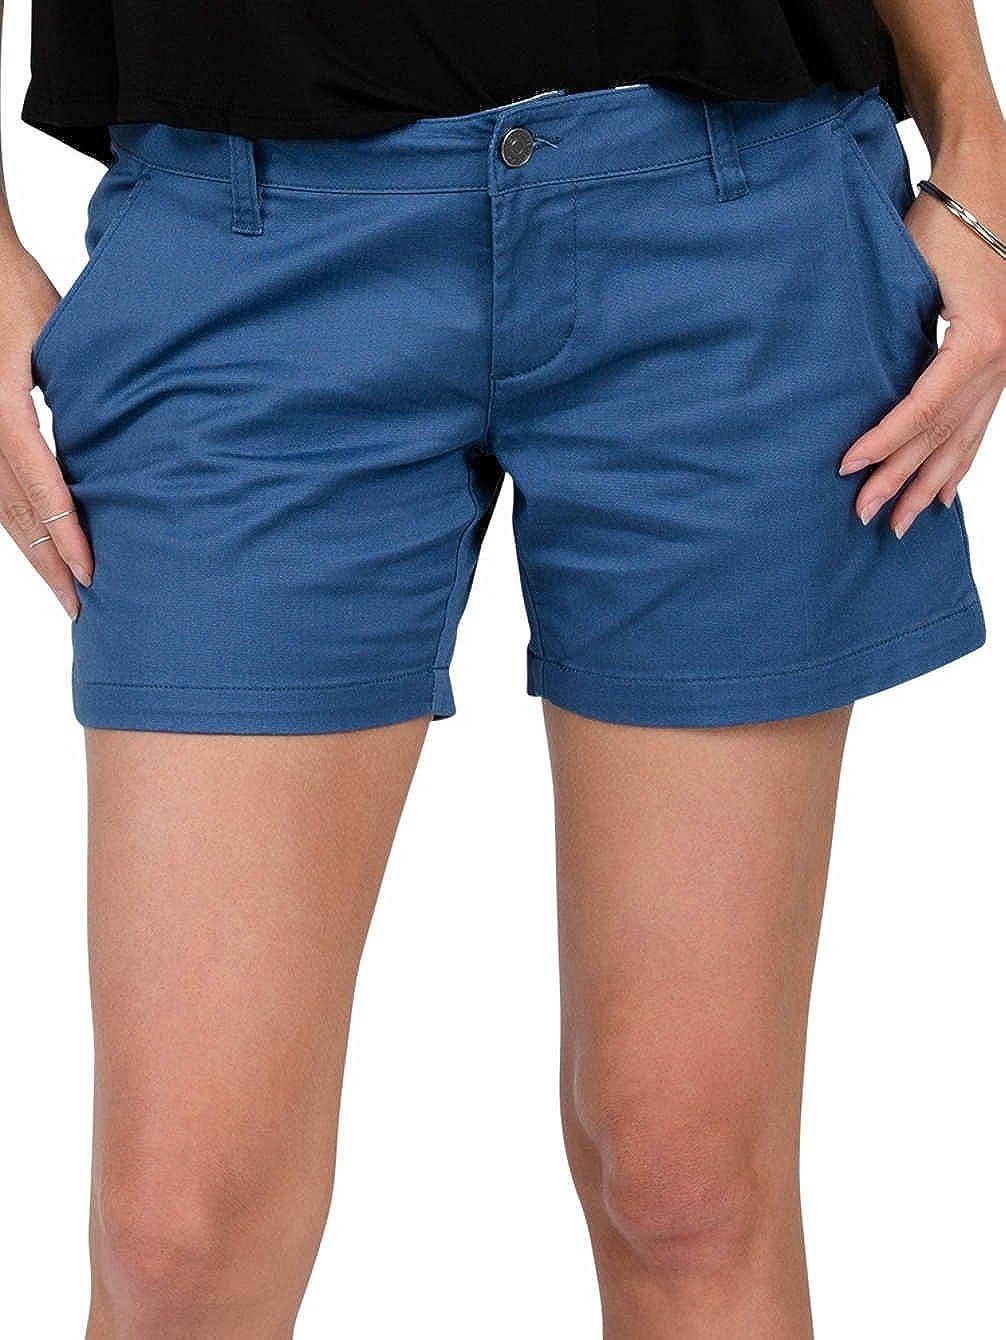 TALLA 31. Volcom Froch ickie Midi Short Azul Pantalones Cortos para